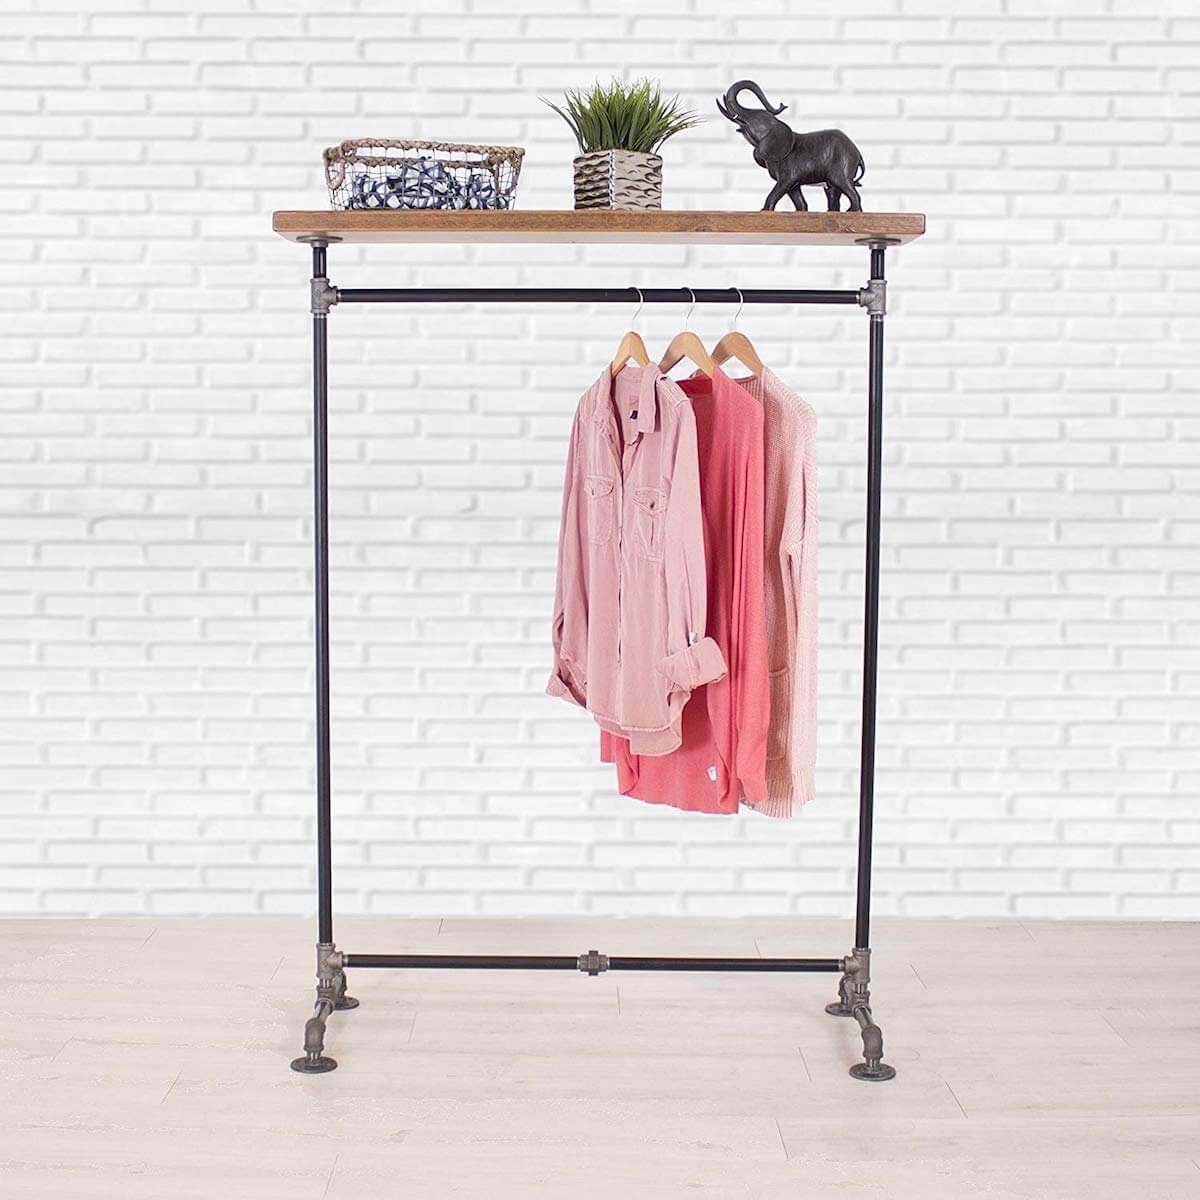 Pipe Shelf Clothing Rack